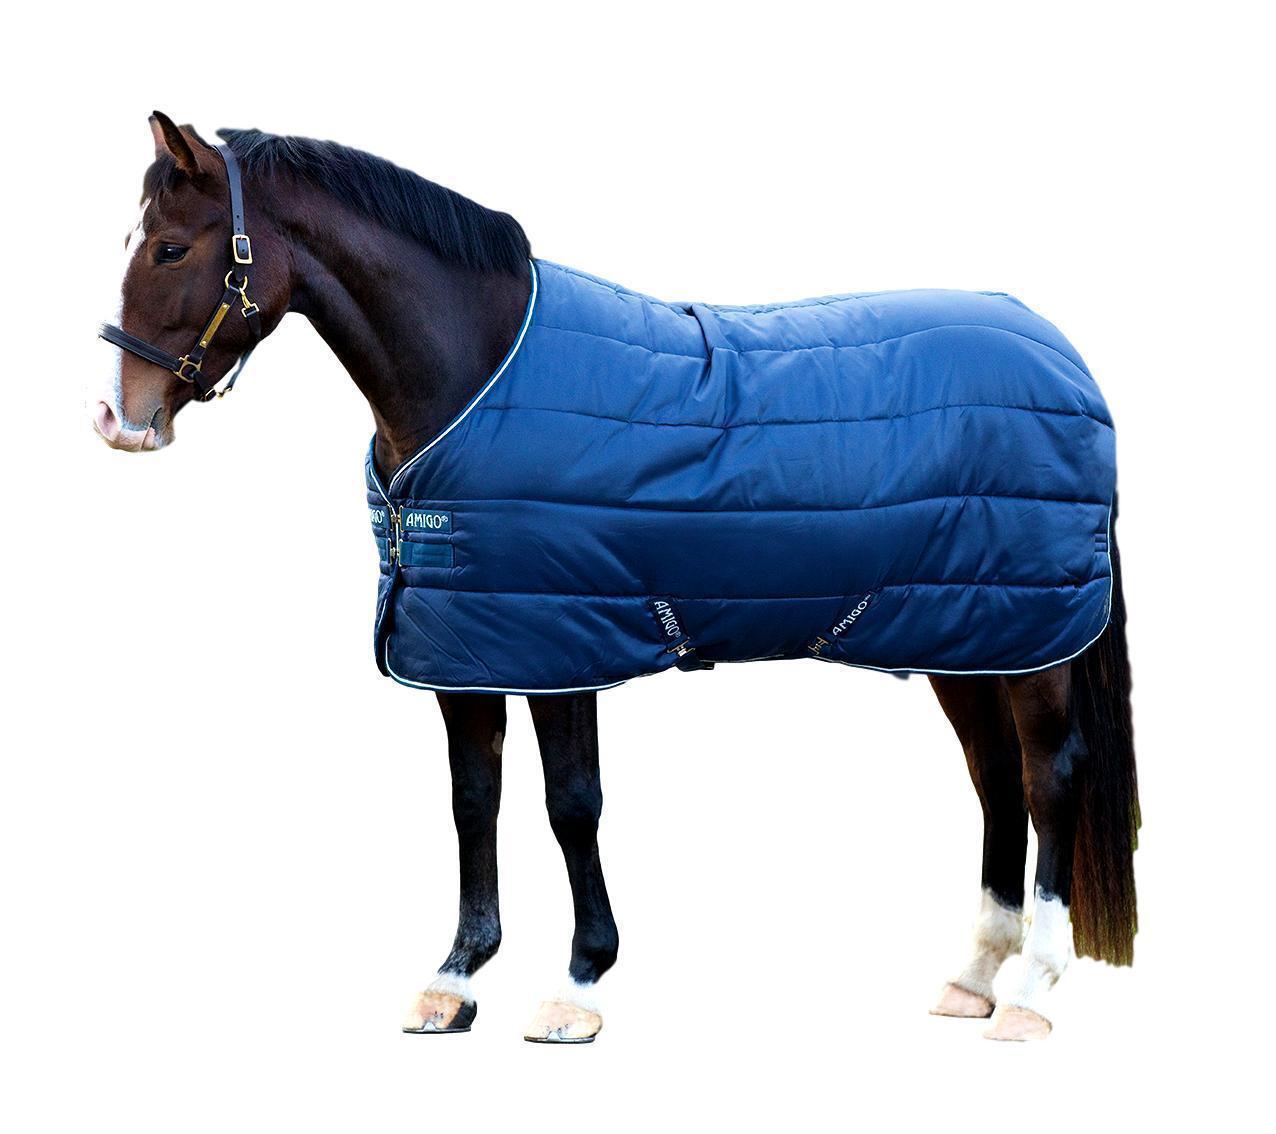 Horseware Ireland Amigo Insulator Stable Blanket Heavyweight 350g Fill